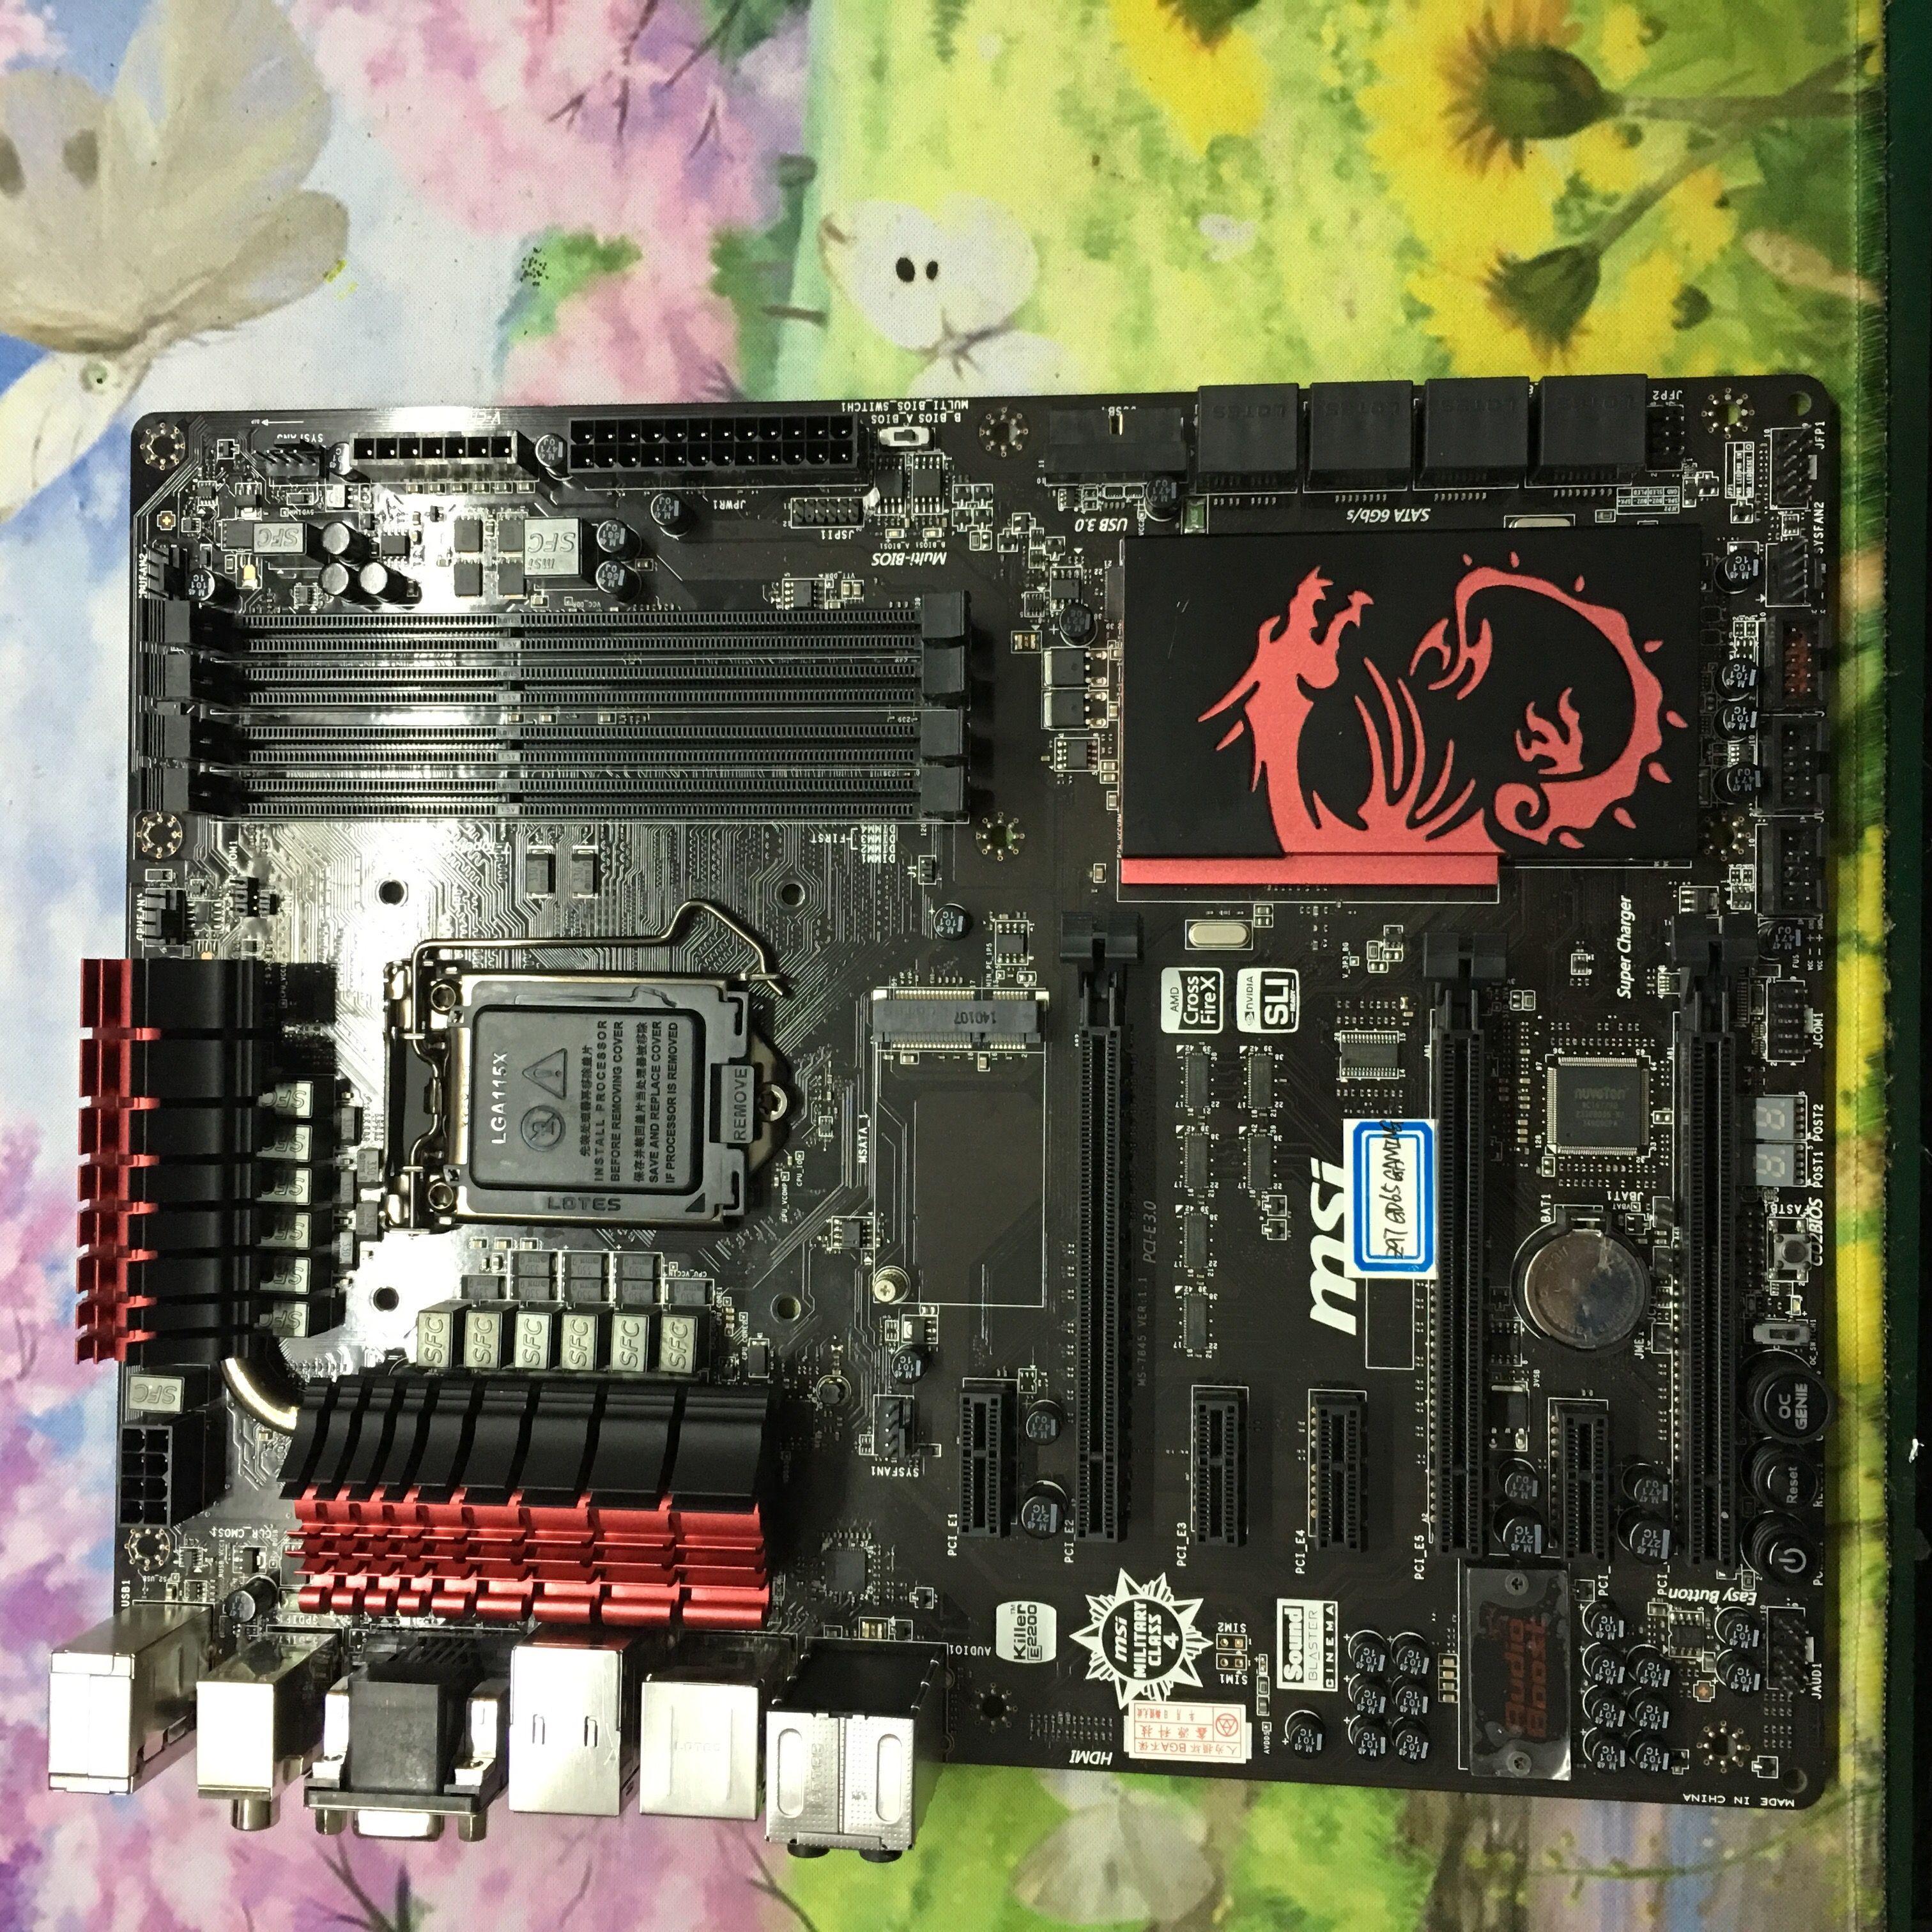 MSI Z97-GD65 GAMING killer card 1150 pin Z97 motherboard support I7